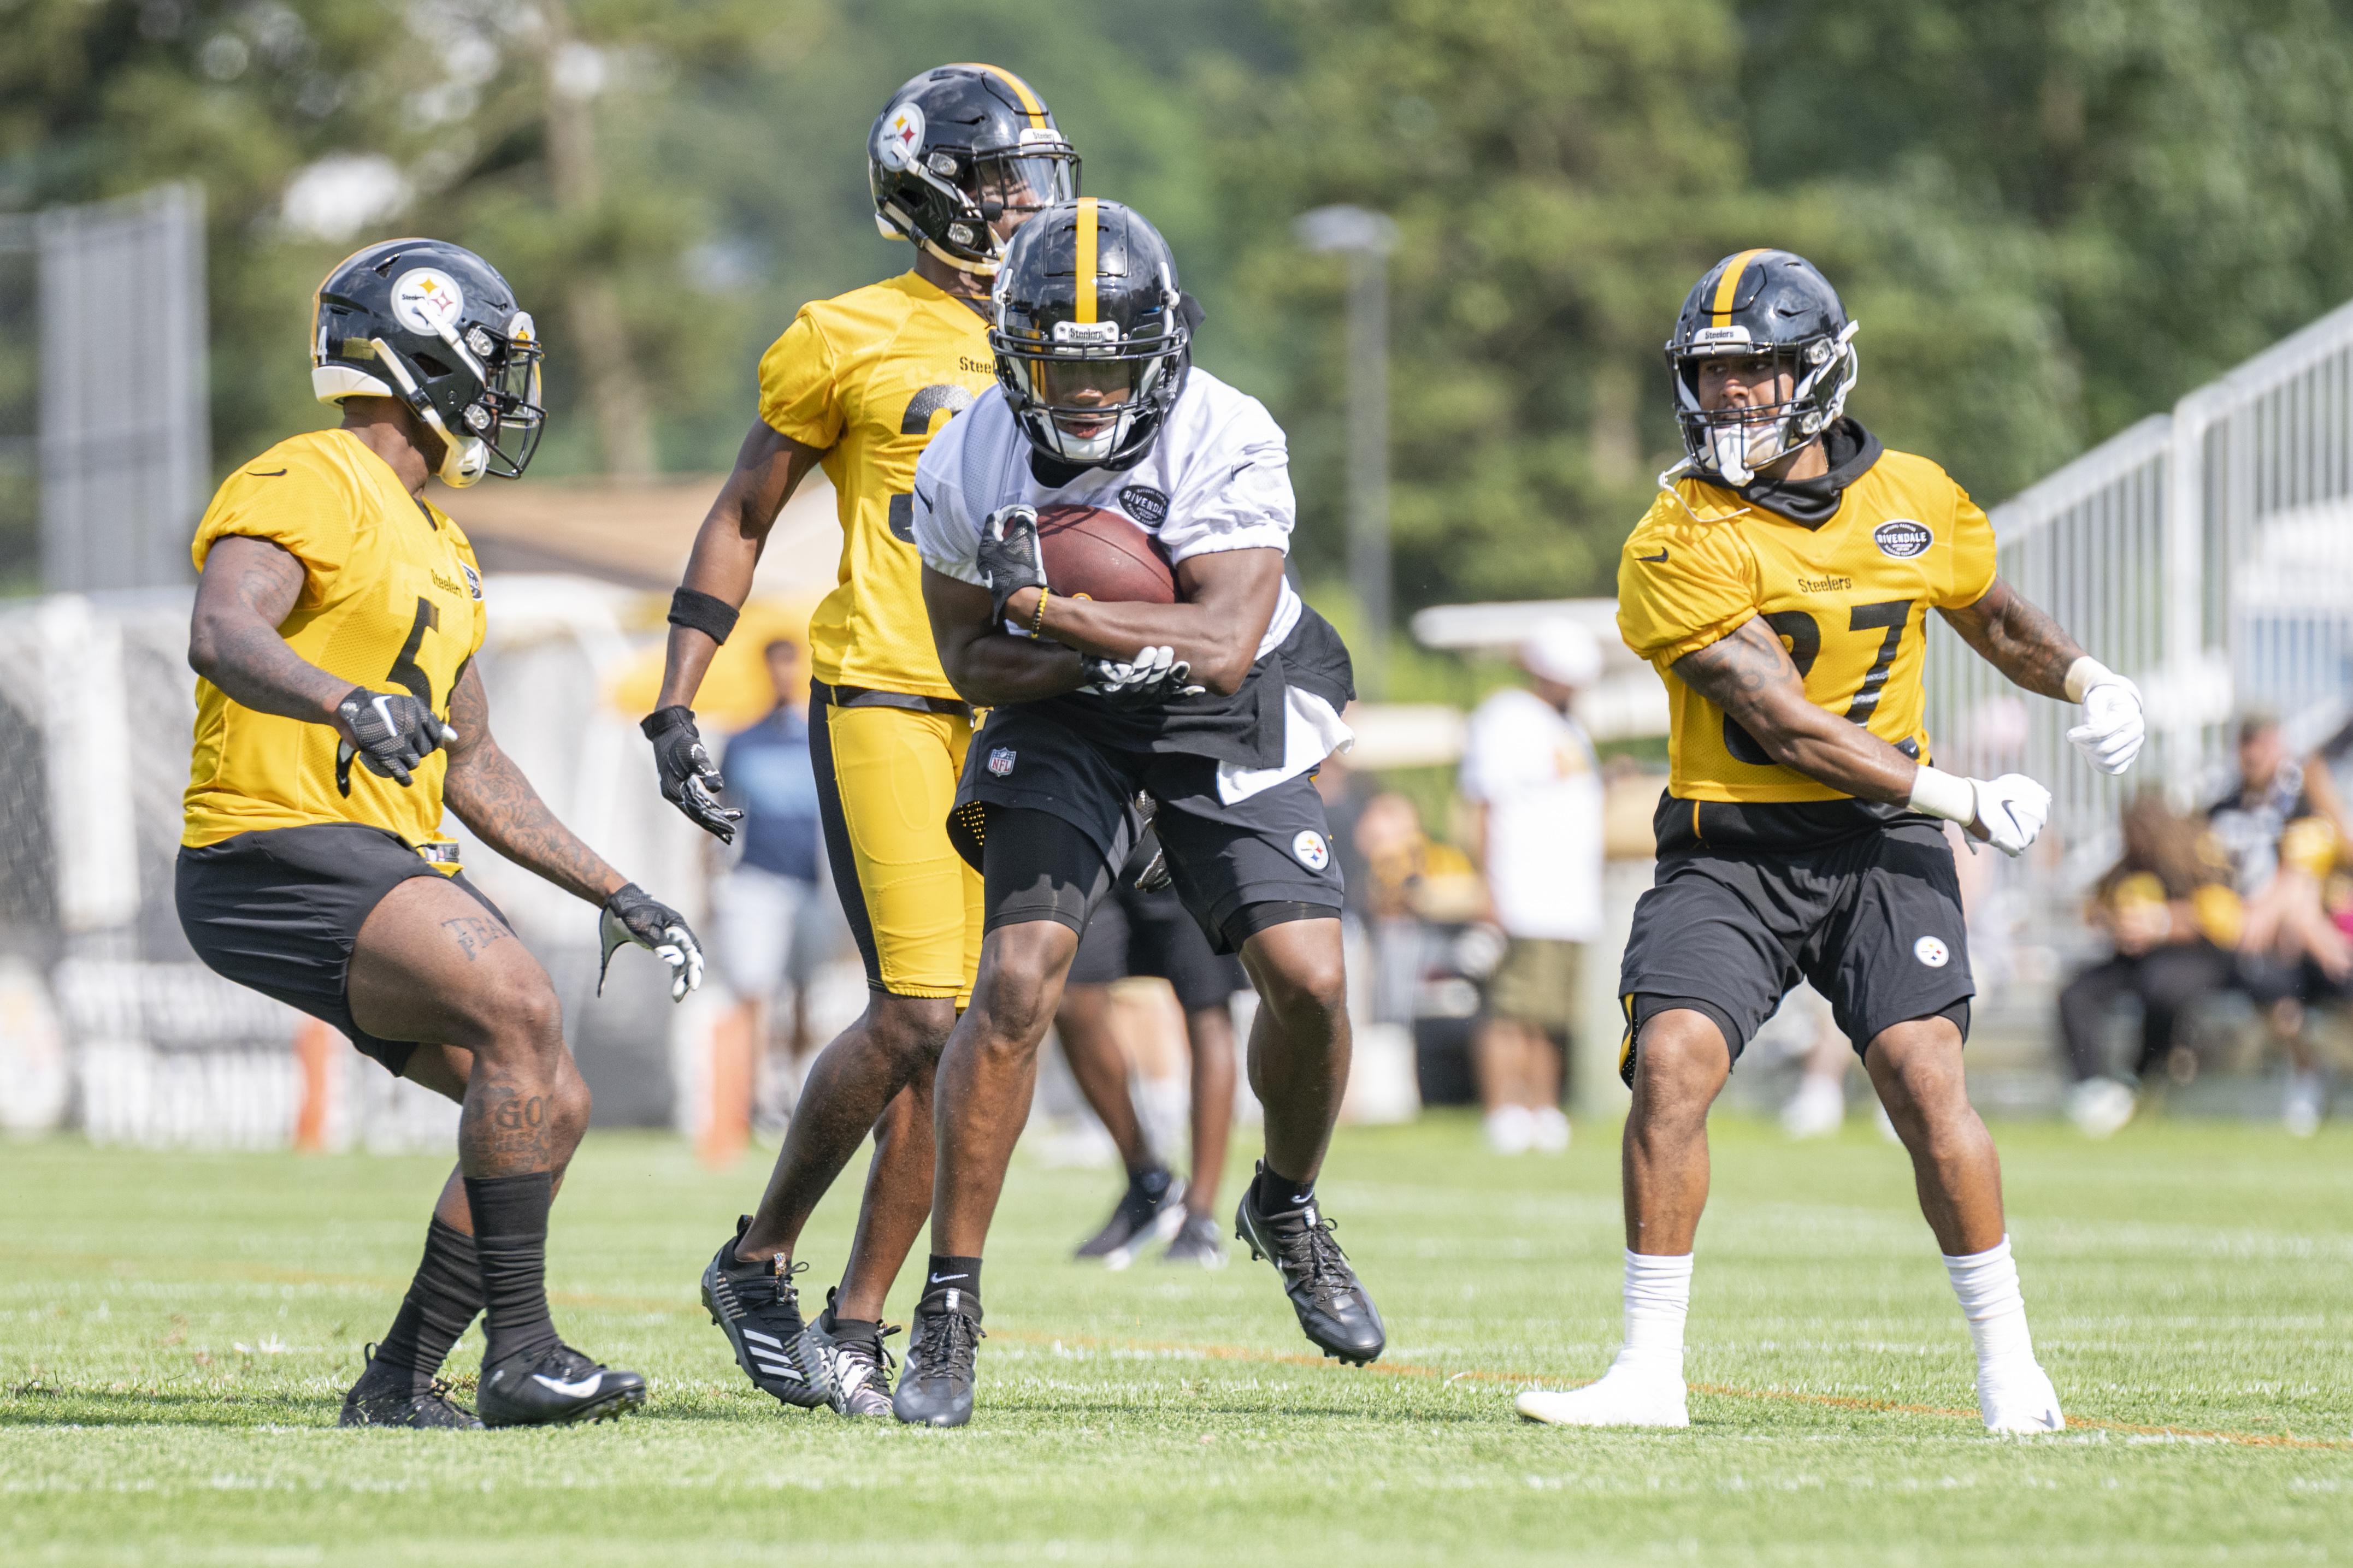 NFL: JUL 26 Steelers Training Camp